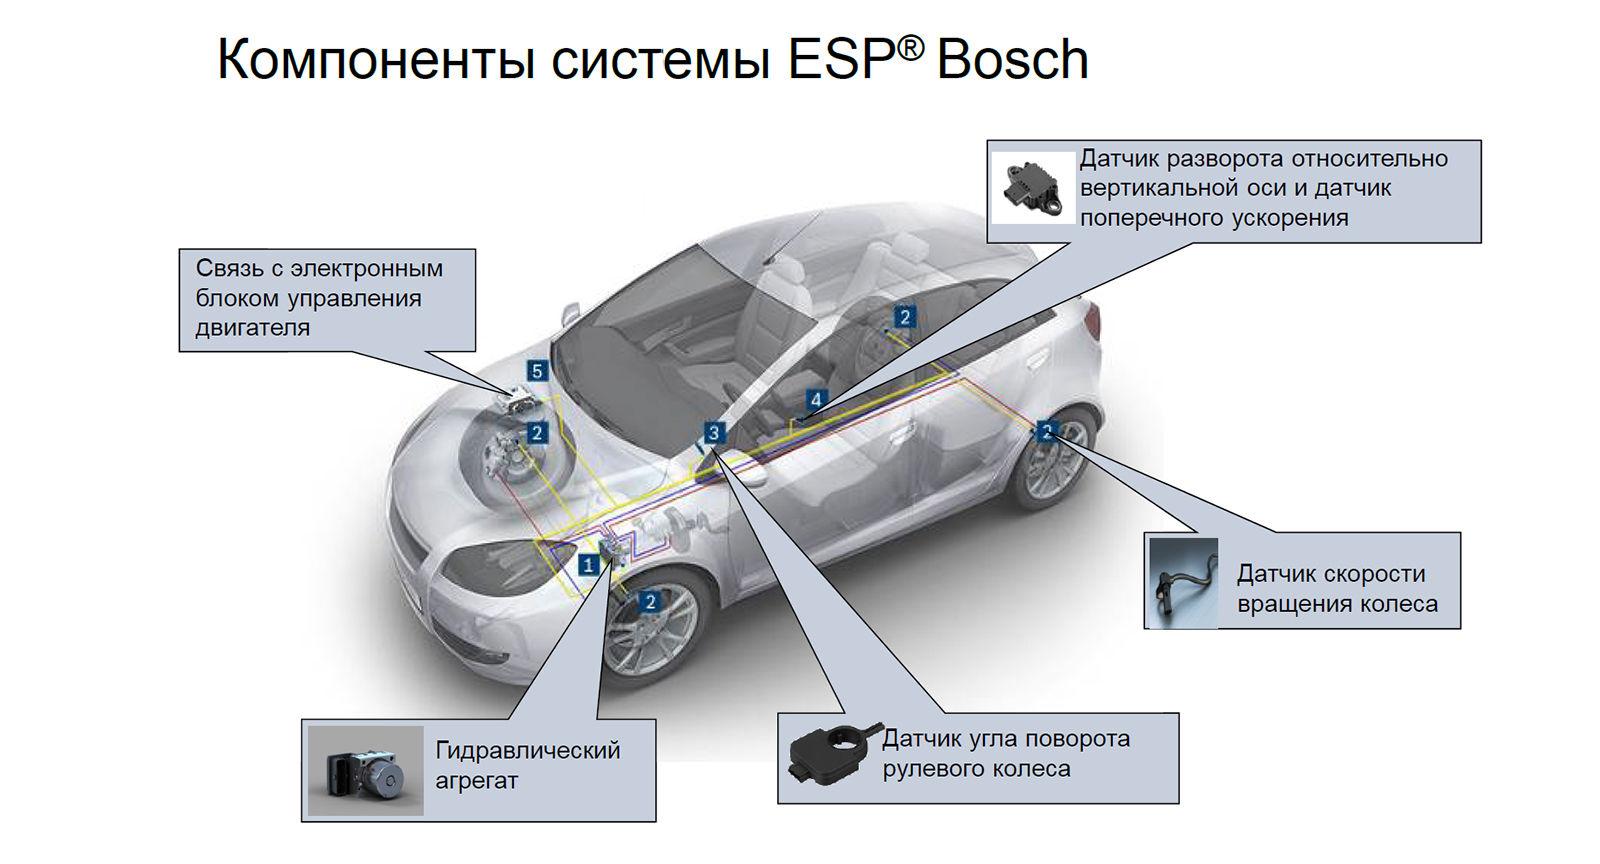 ESP – Electronic Stability Program